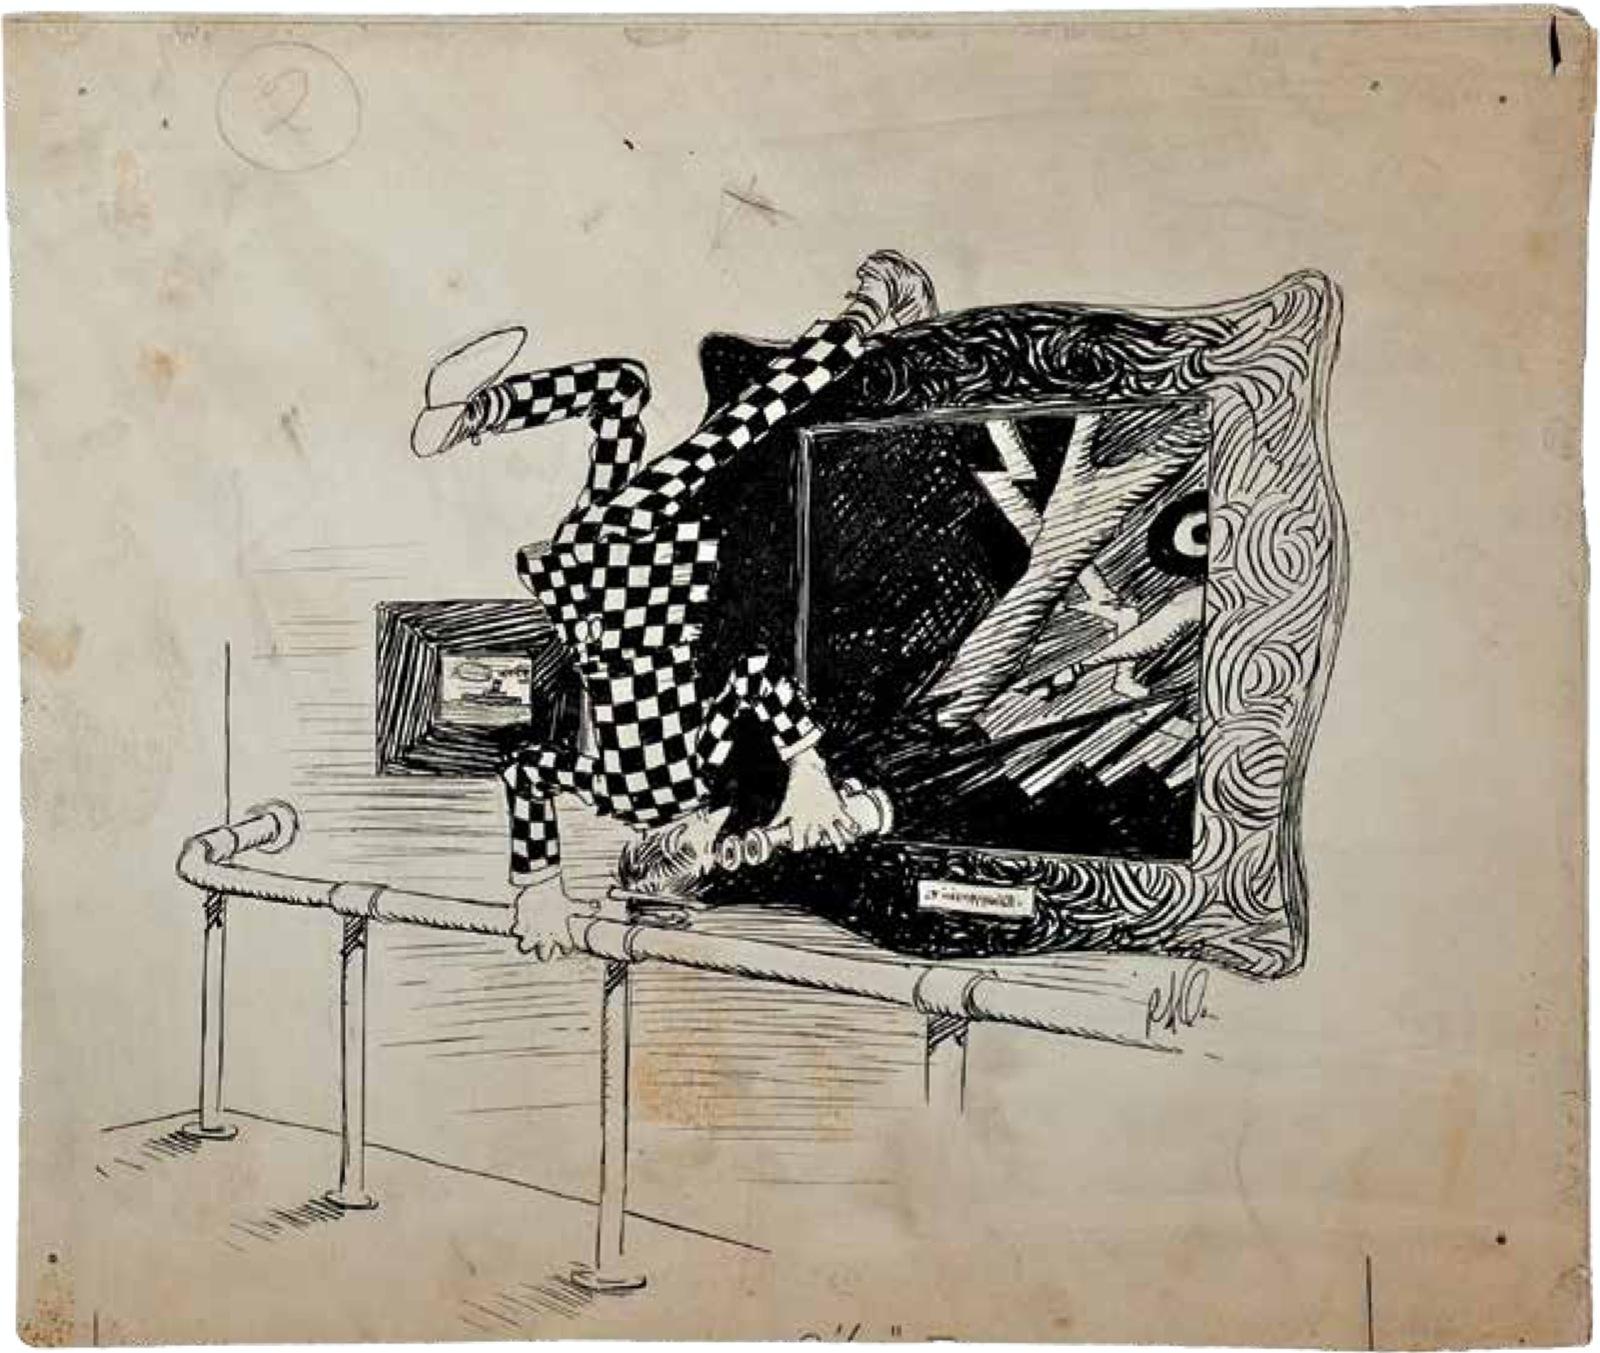 Drawing by Rube Goldberg